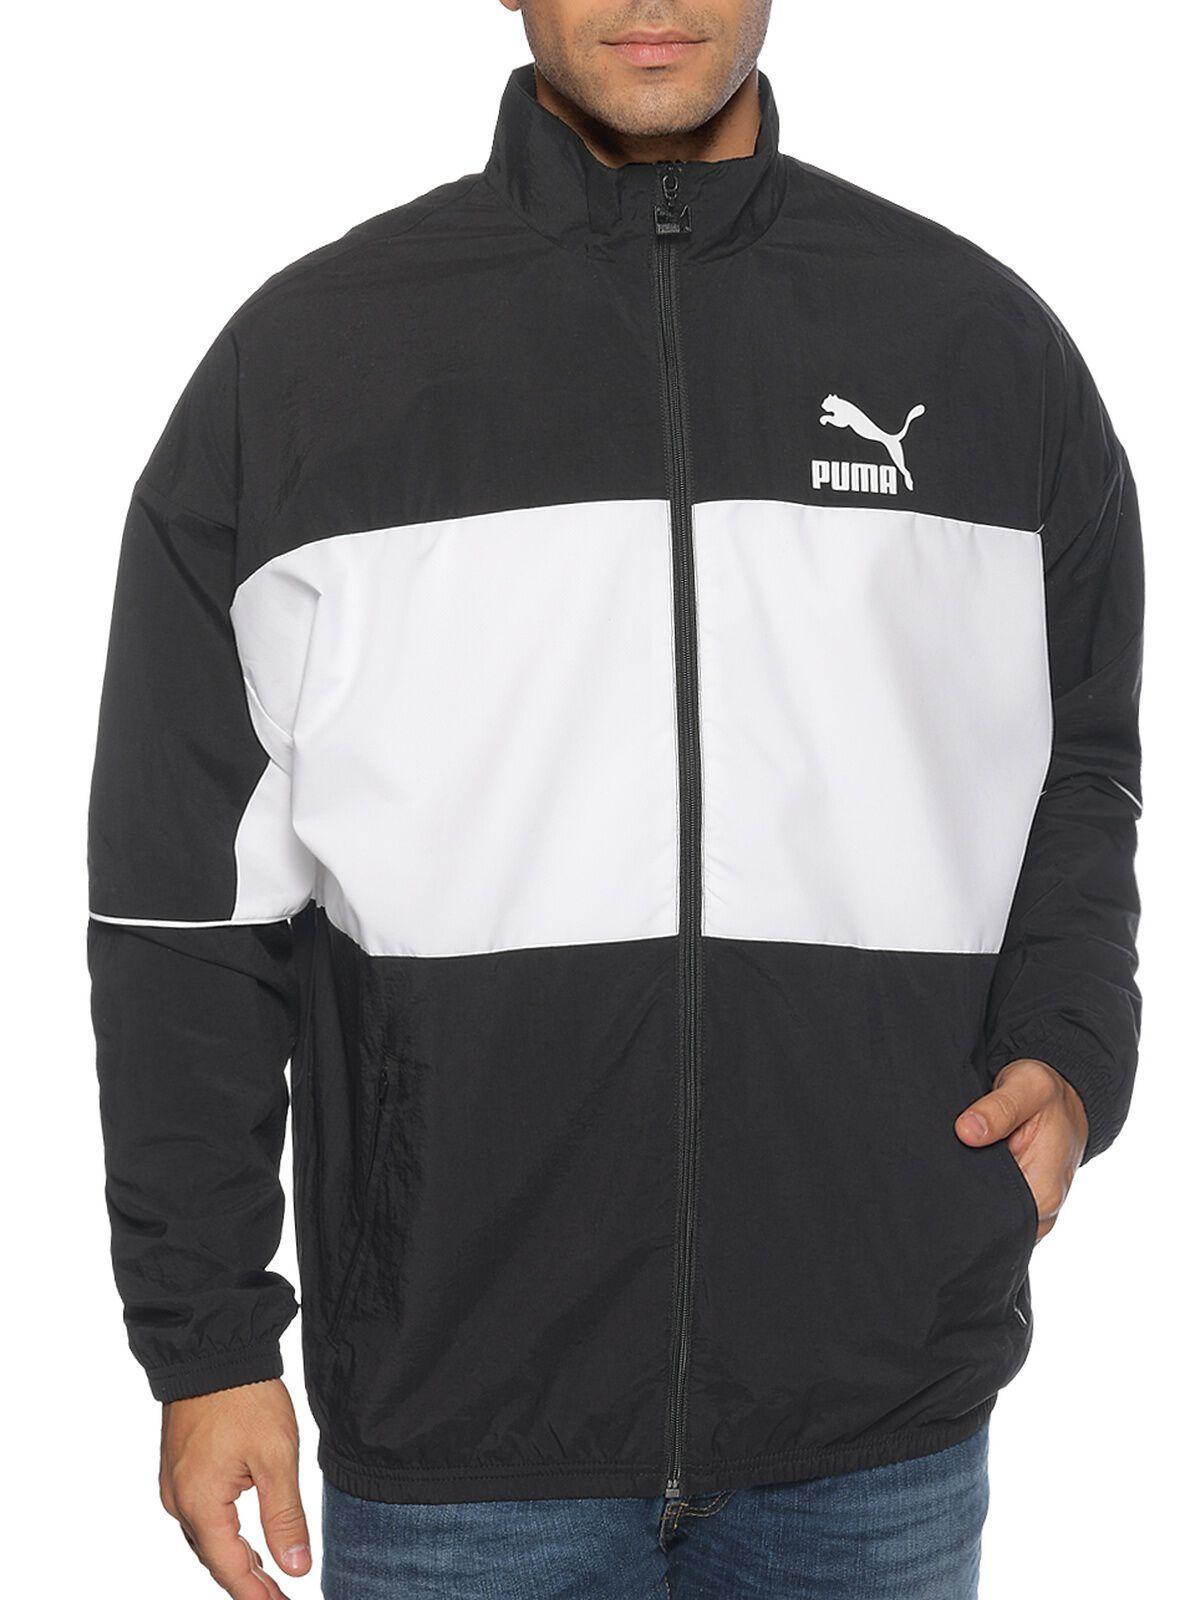 Schwarz Weiße Jacke